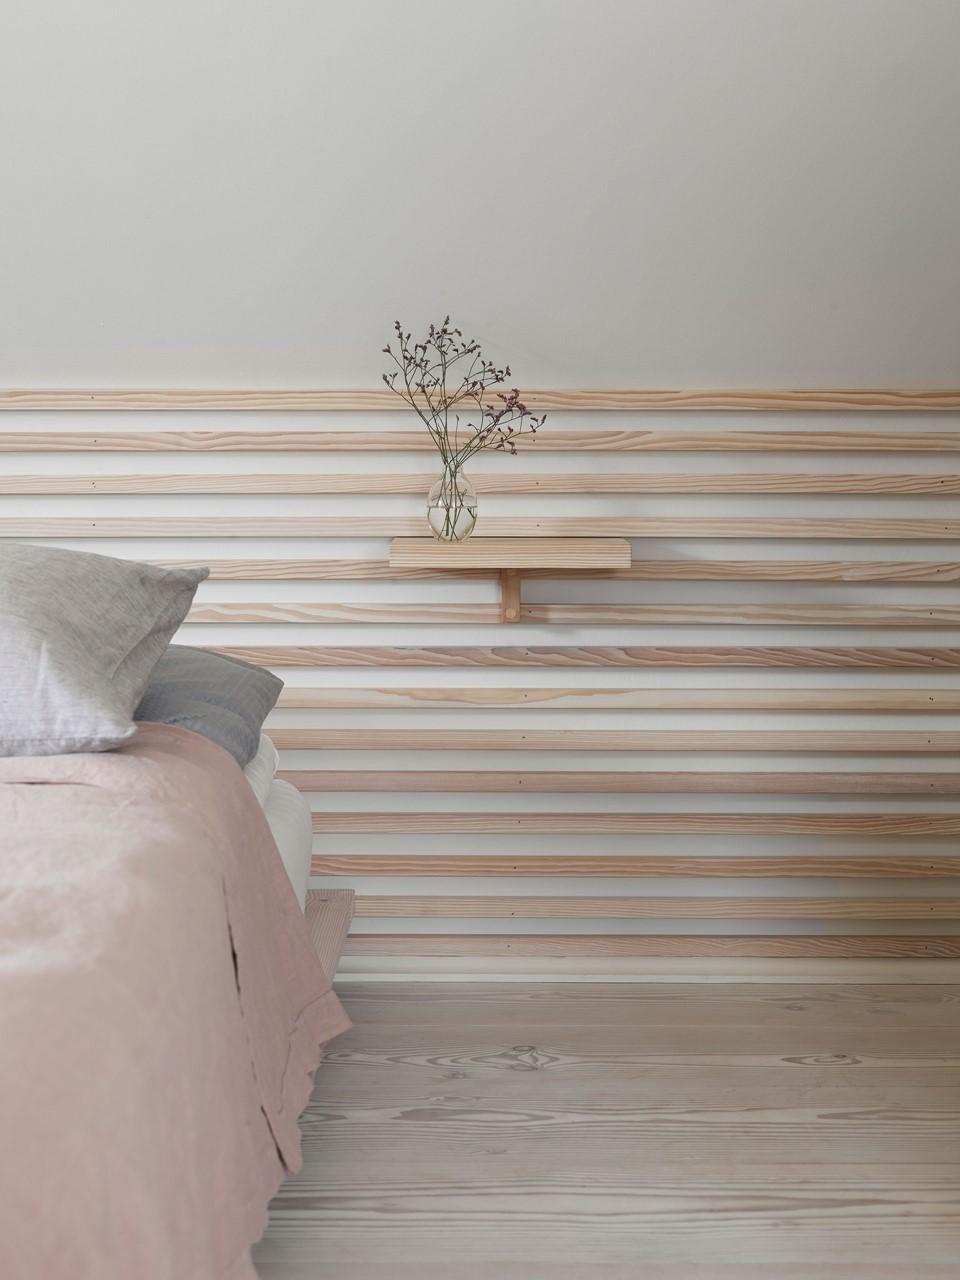 douglas fir floor lye white soap underfloor heating wood panelling dinesen country home.jpg